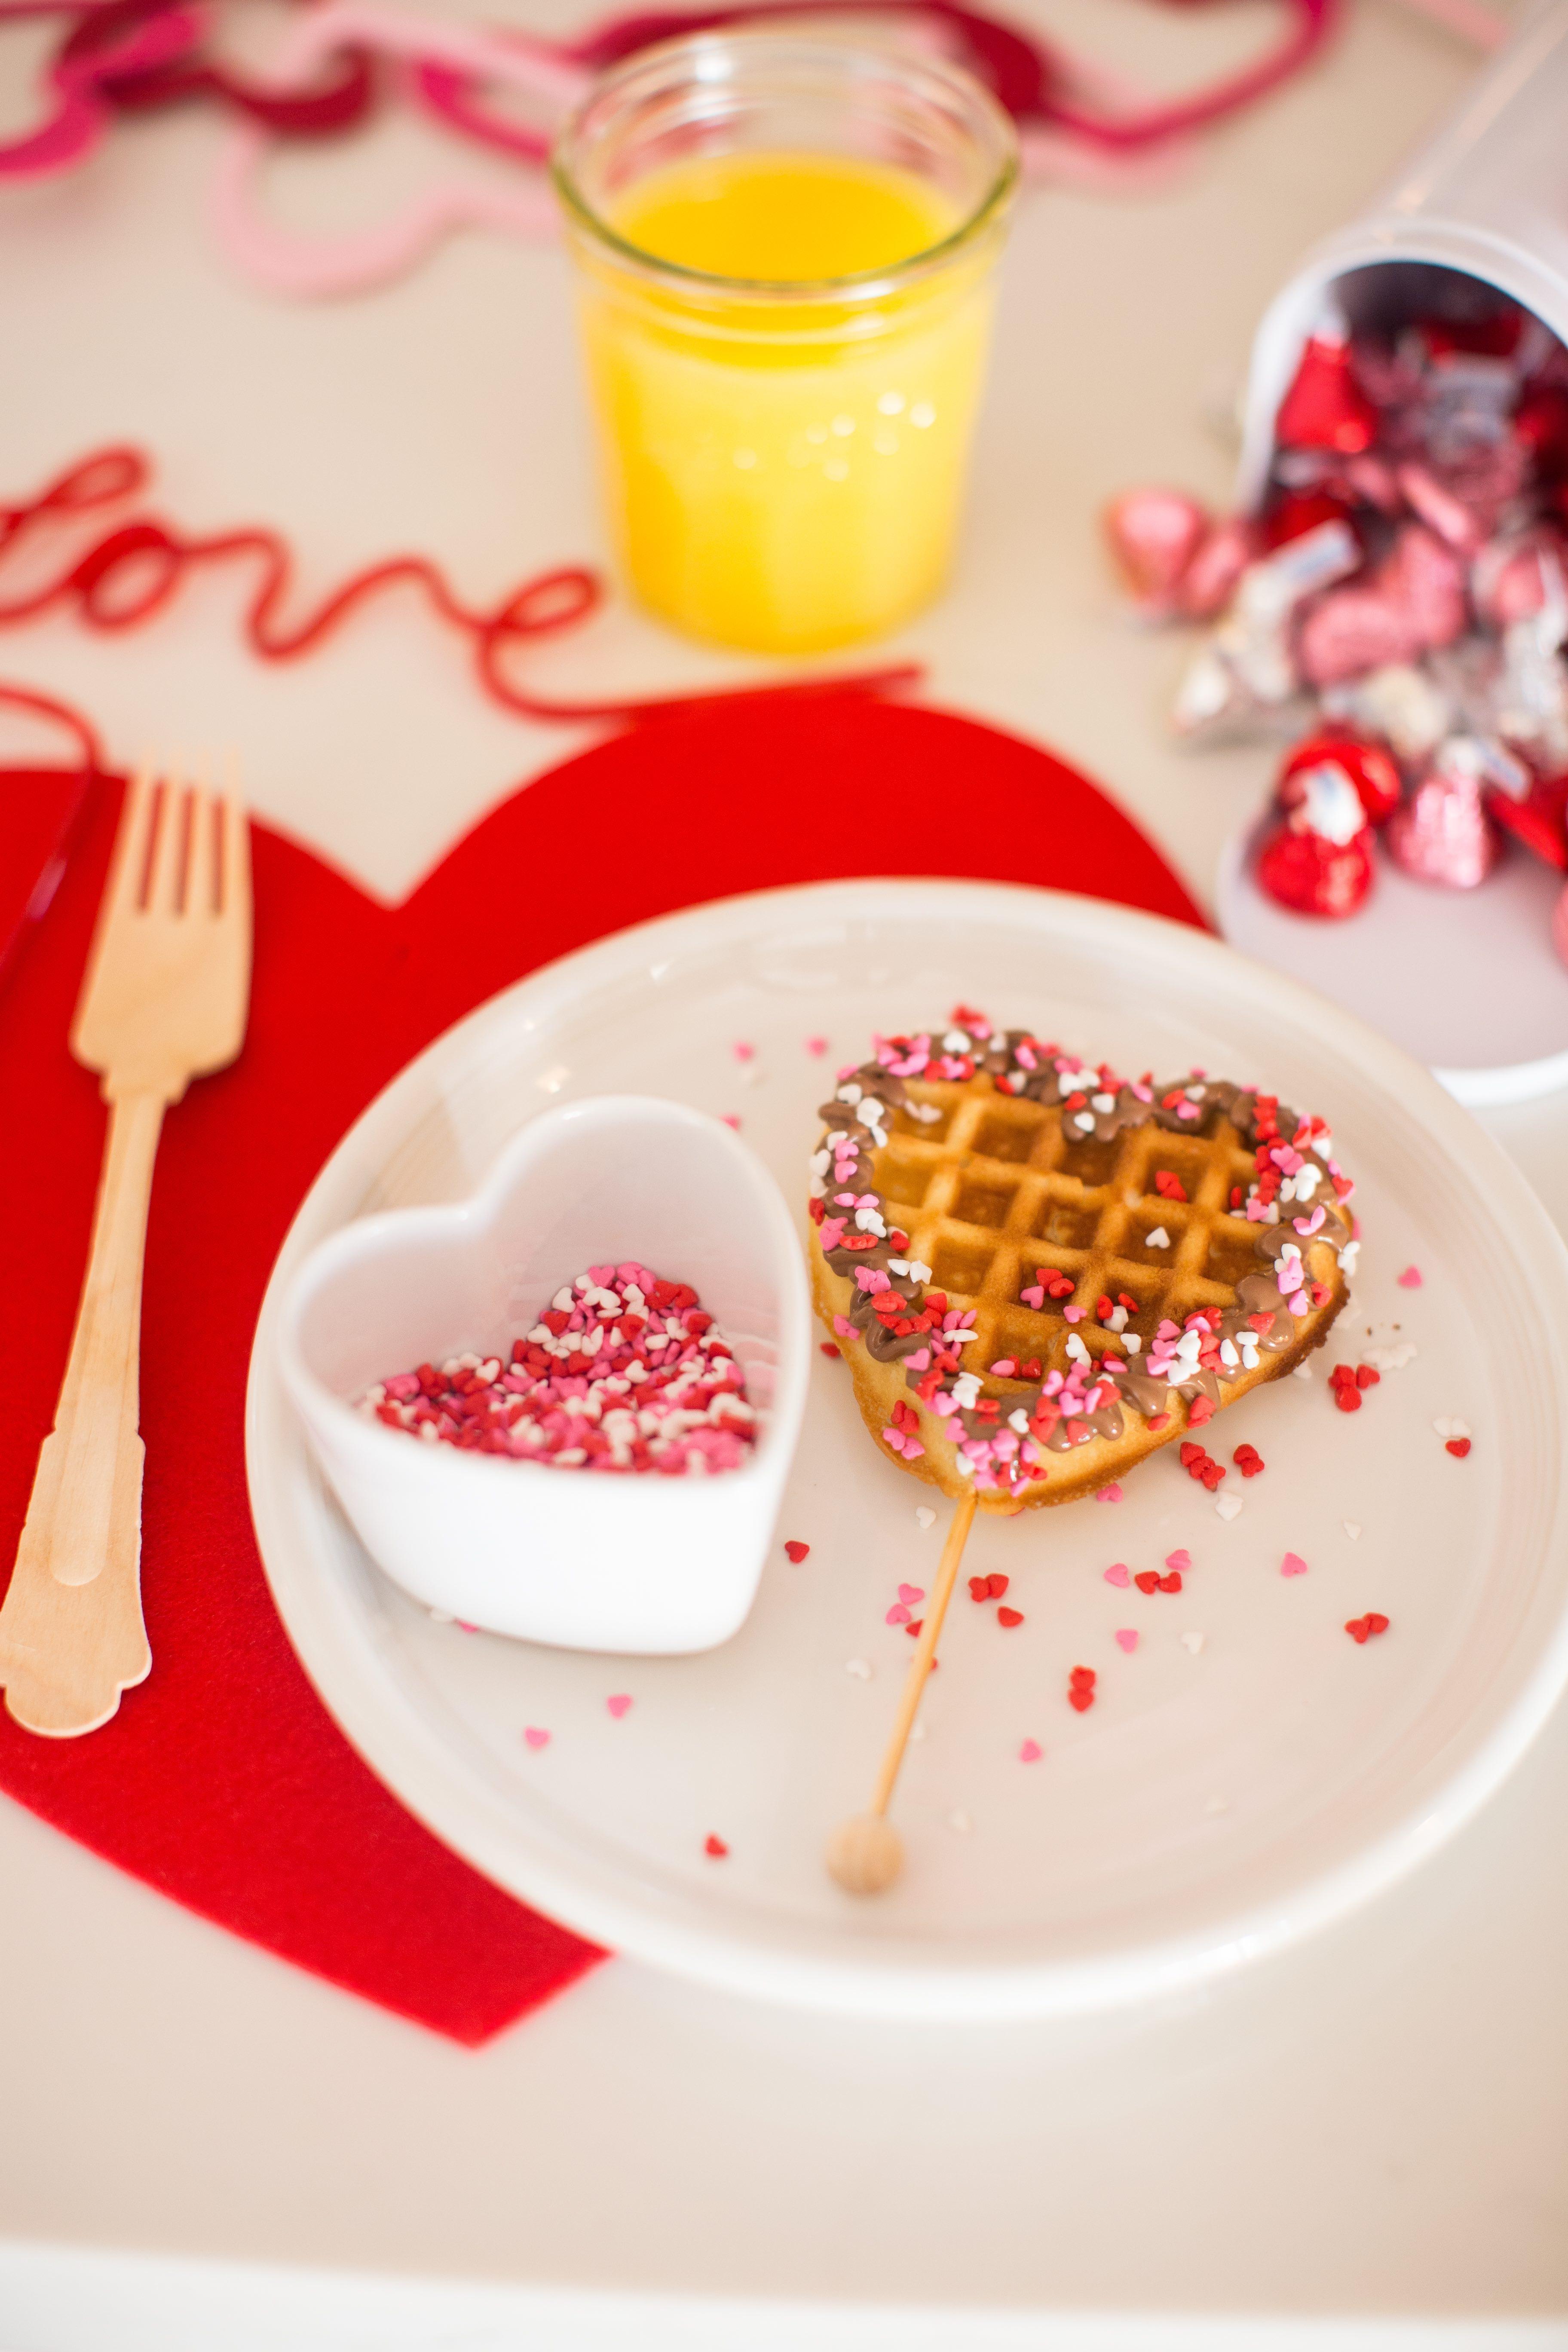 Valentines Heart Shaped Waffles Just Destiny 20 Resize